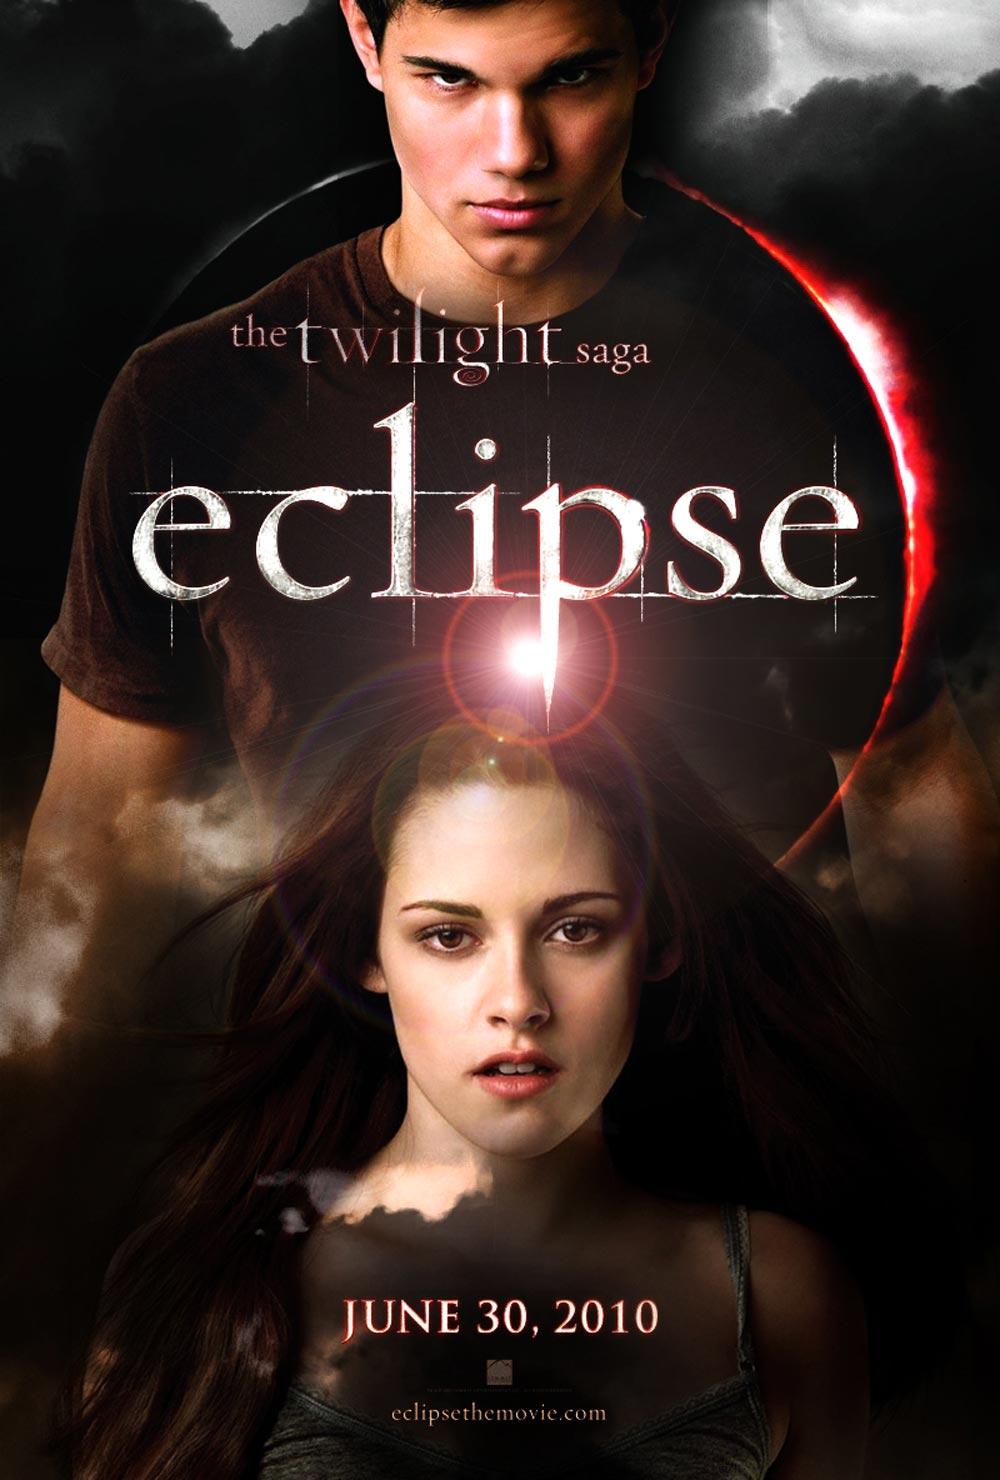 http://www.filmofilia.com/wp-content/uploads/2009/12/twilight_eclipse_poster_3.jpg